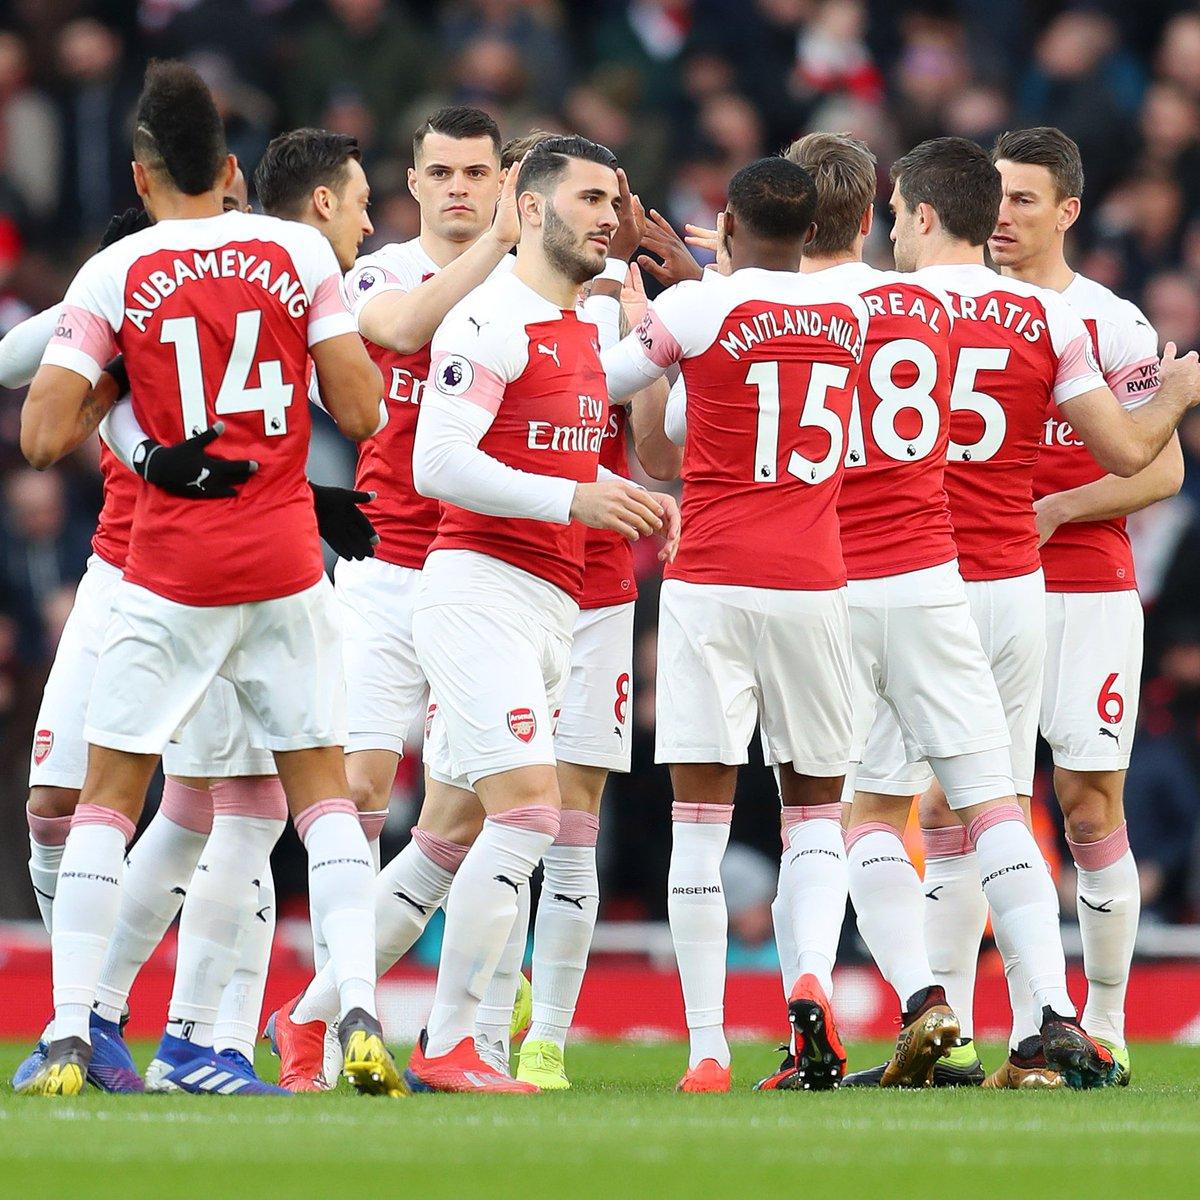 Arsenal FC's photo on Molineux